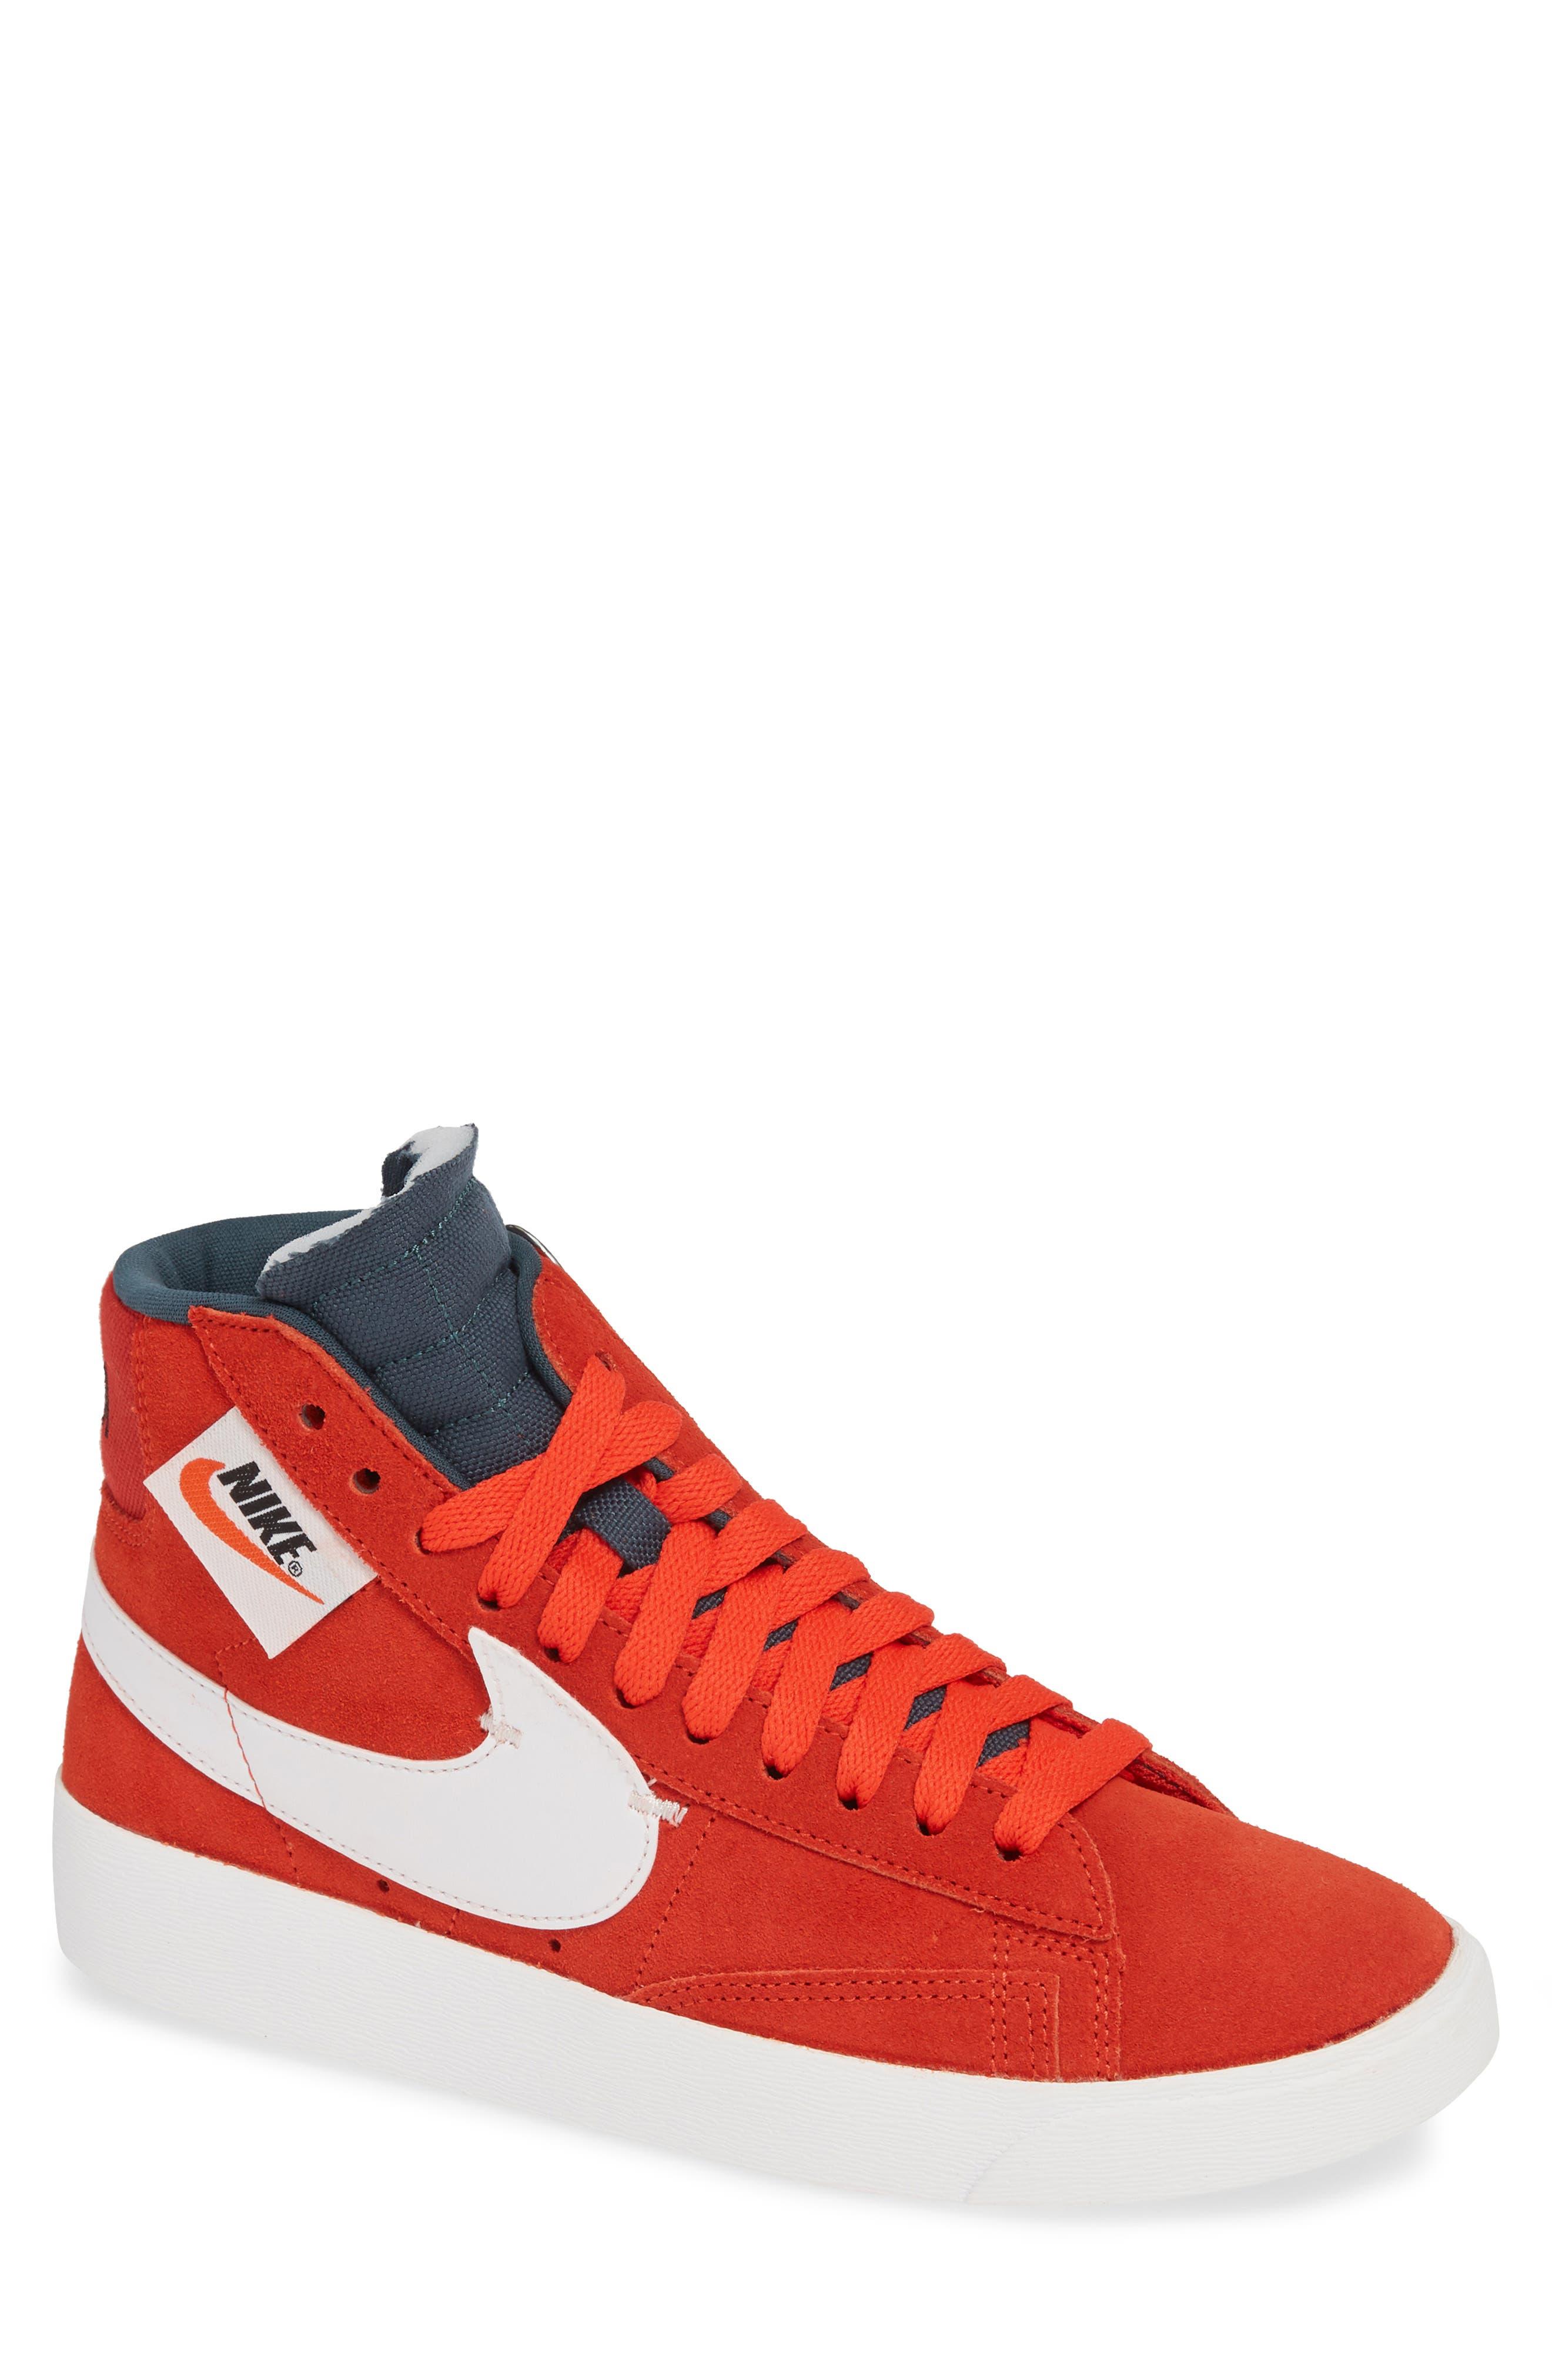 NIKE Blazer Mid Rebel Sneaker, Main, color, 601